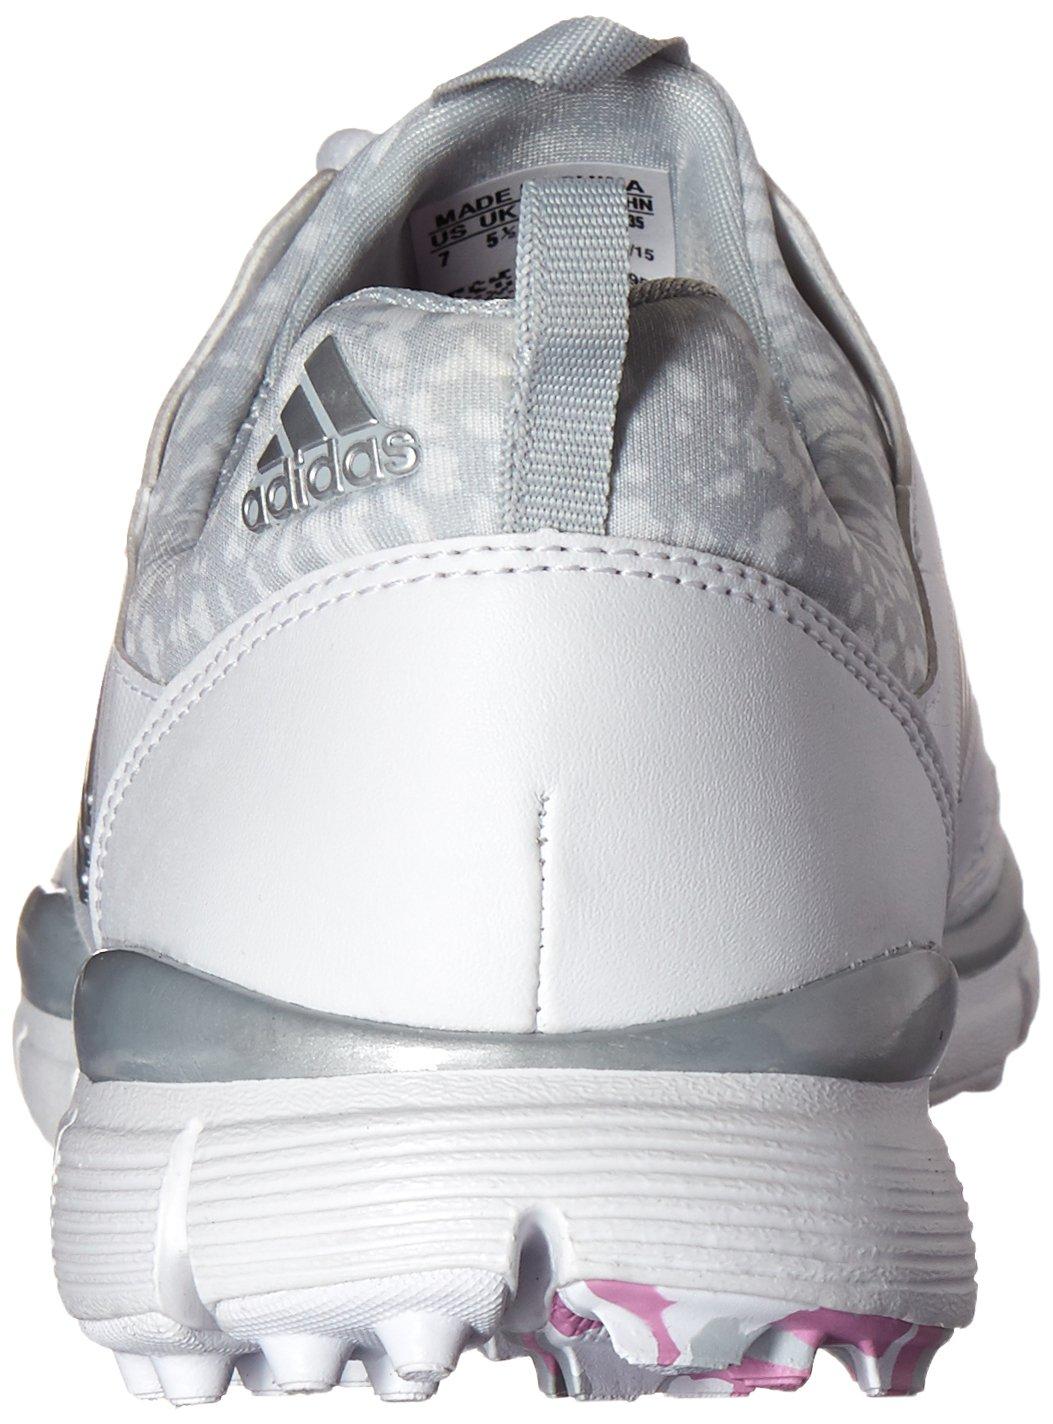 adidas Women's W Adistar Sport Spikeless Golf Shoe B013UTNDPQ 8 B(M) US|Ftwr White/Matte Silver/Wild Orchid-tmag